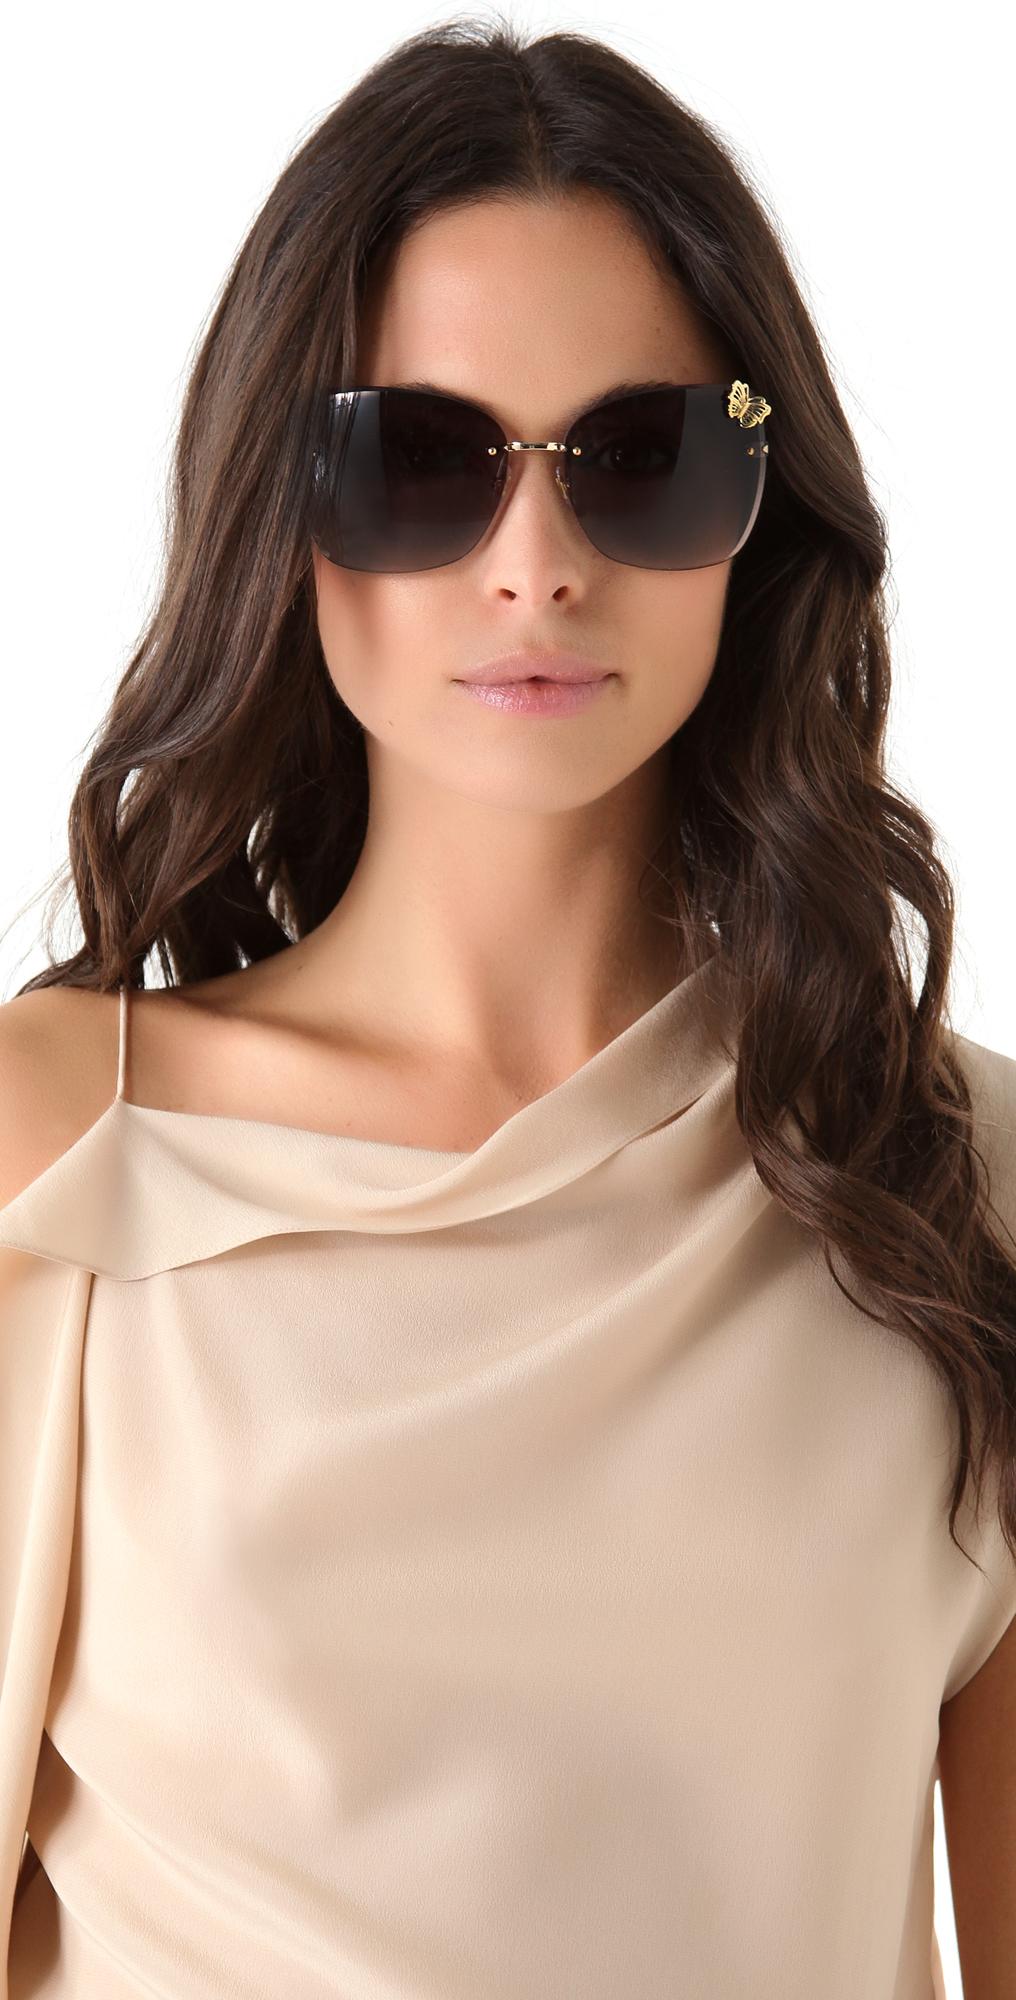 89f07cdff0 Lyst - Gucci Butterfly Butterfly Sunglasses in Metallic